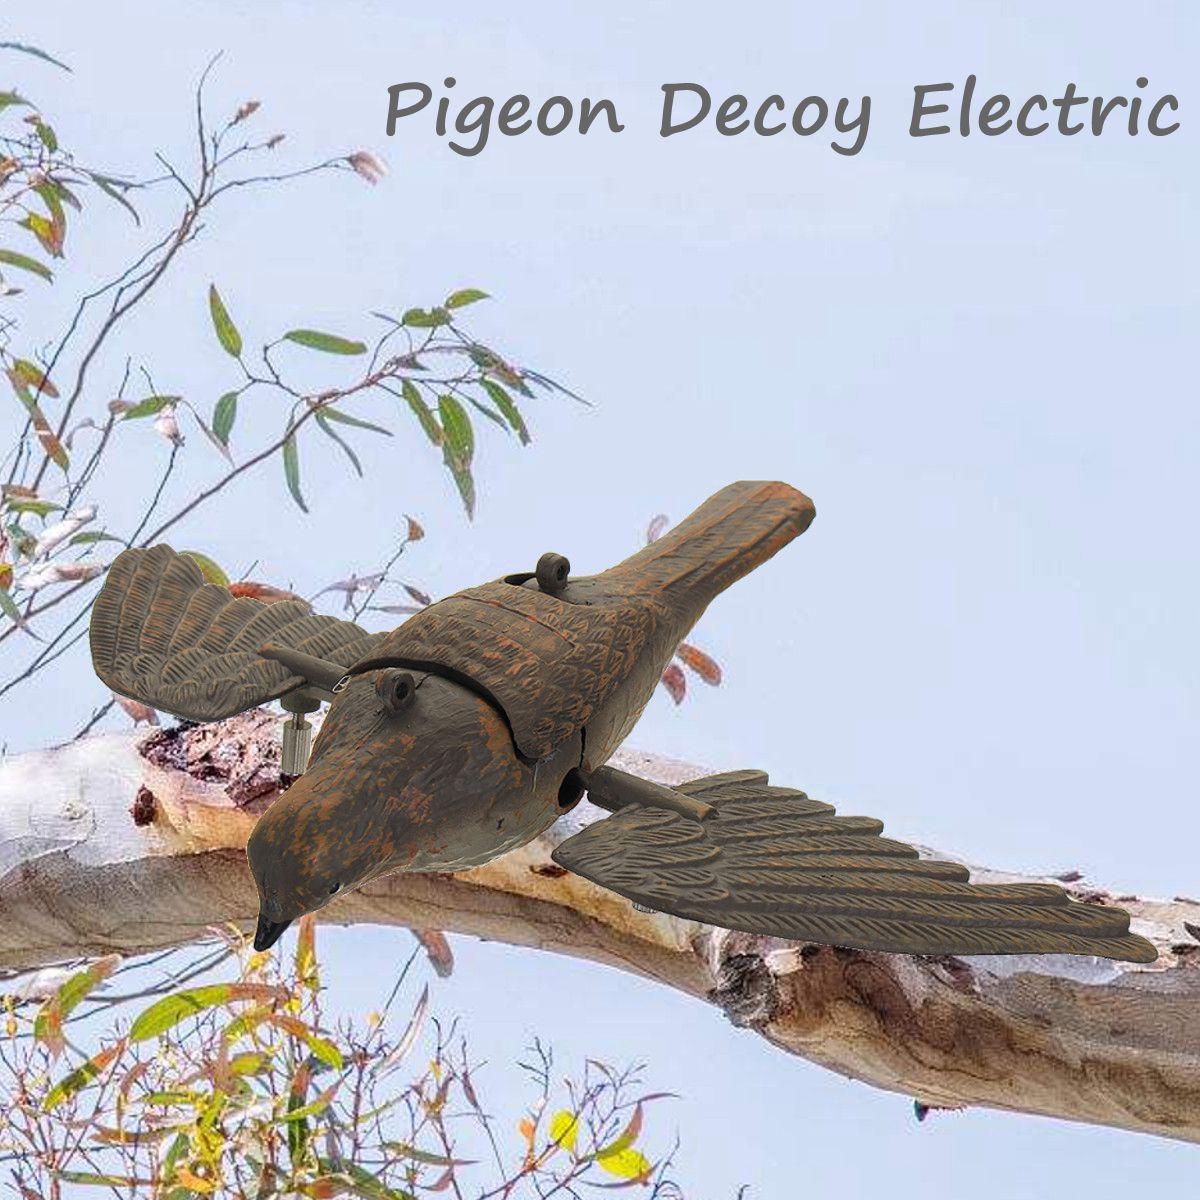 Simulation Pigeon PE Outdoor Field Hunting Engine Birds Decoy Motorized Bird Decoy Practice Garden Decoration Hunting Decoy our garden birds